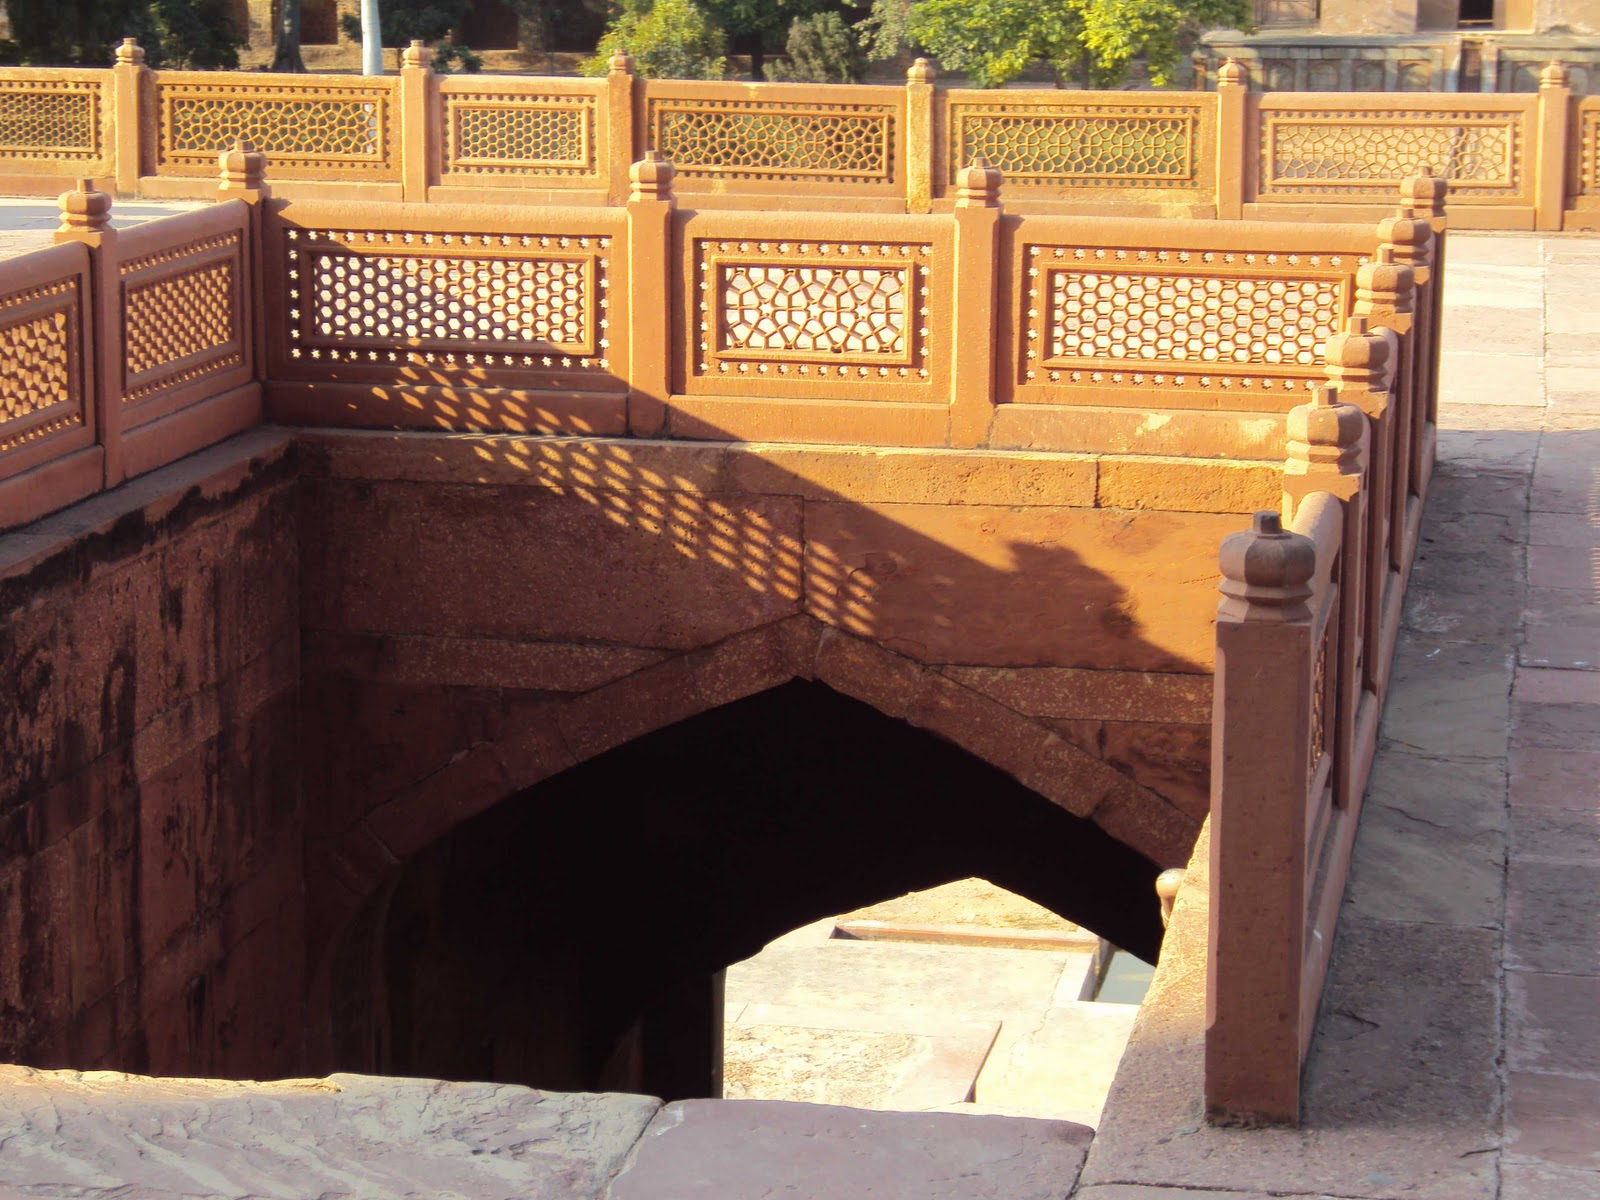 Architecture student 39 s corner humayun 39 s tomb delhi for Architecture firms for internship in india